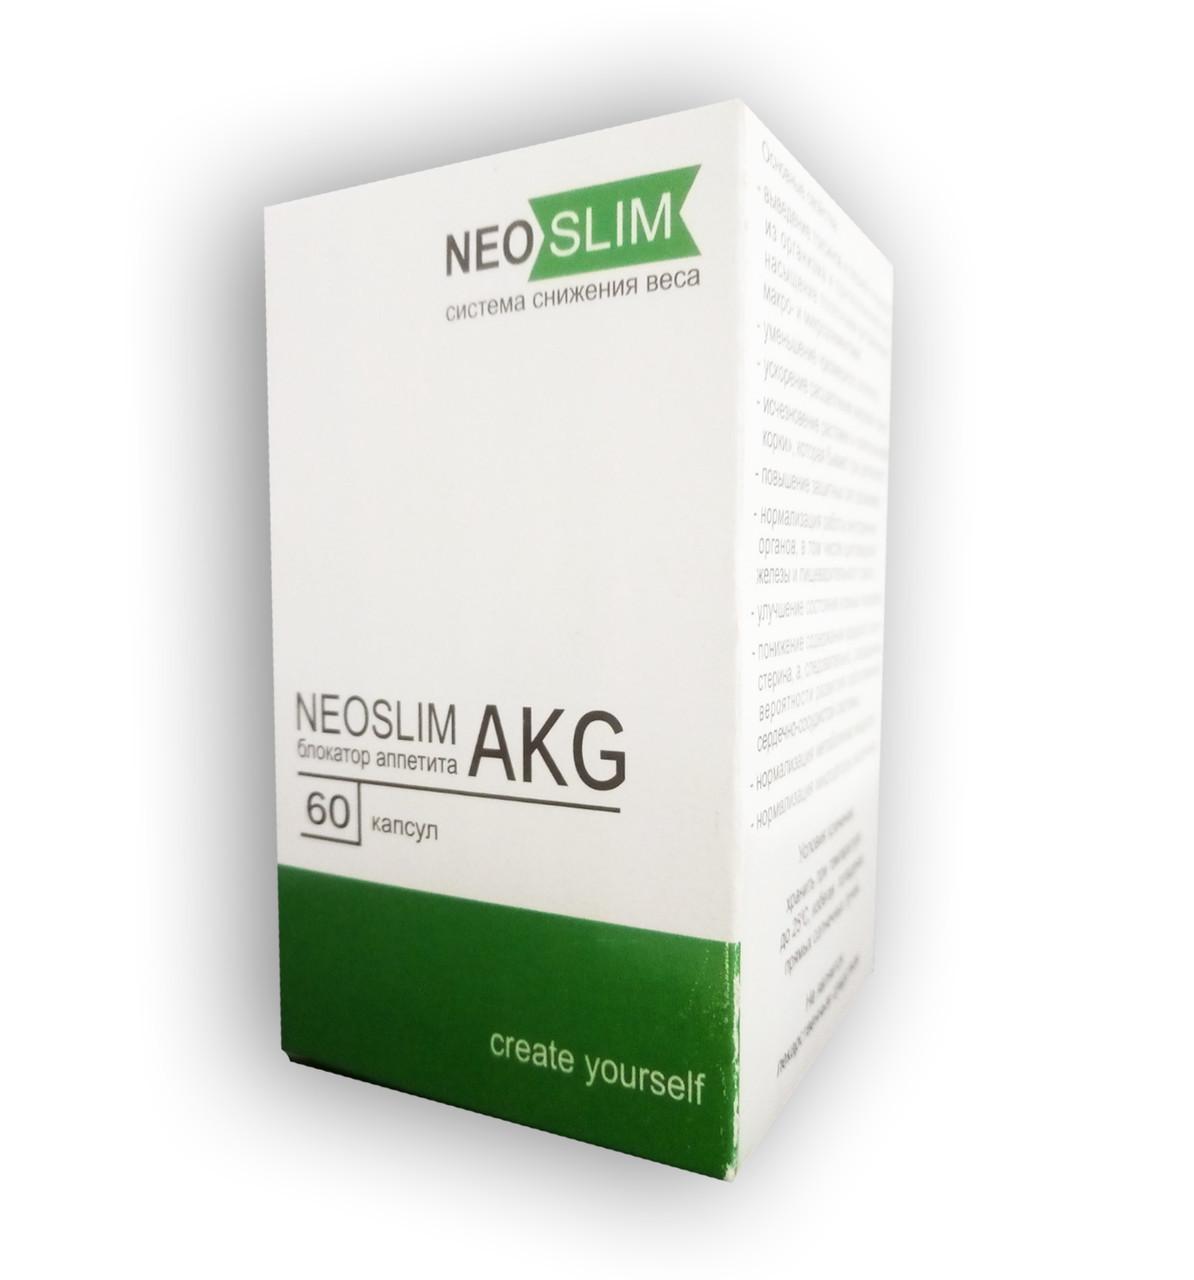 Neo Slim AKG - Комплекс для снижения веса (Нео Слим АКГ)